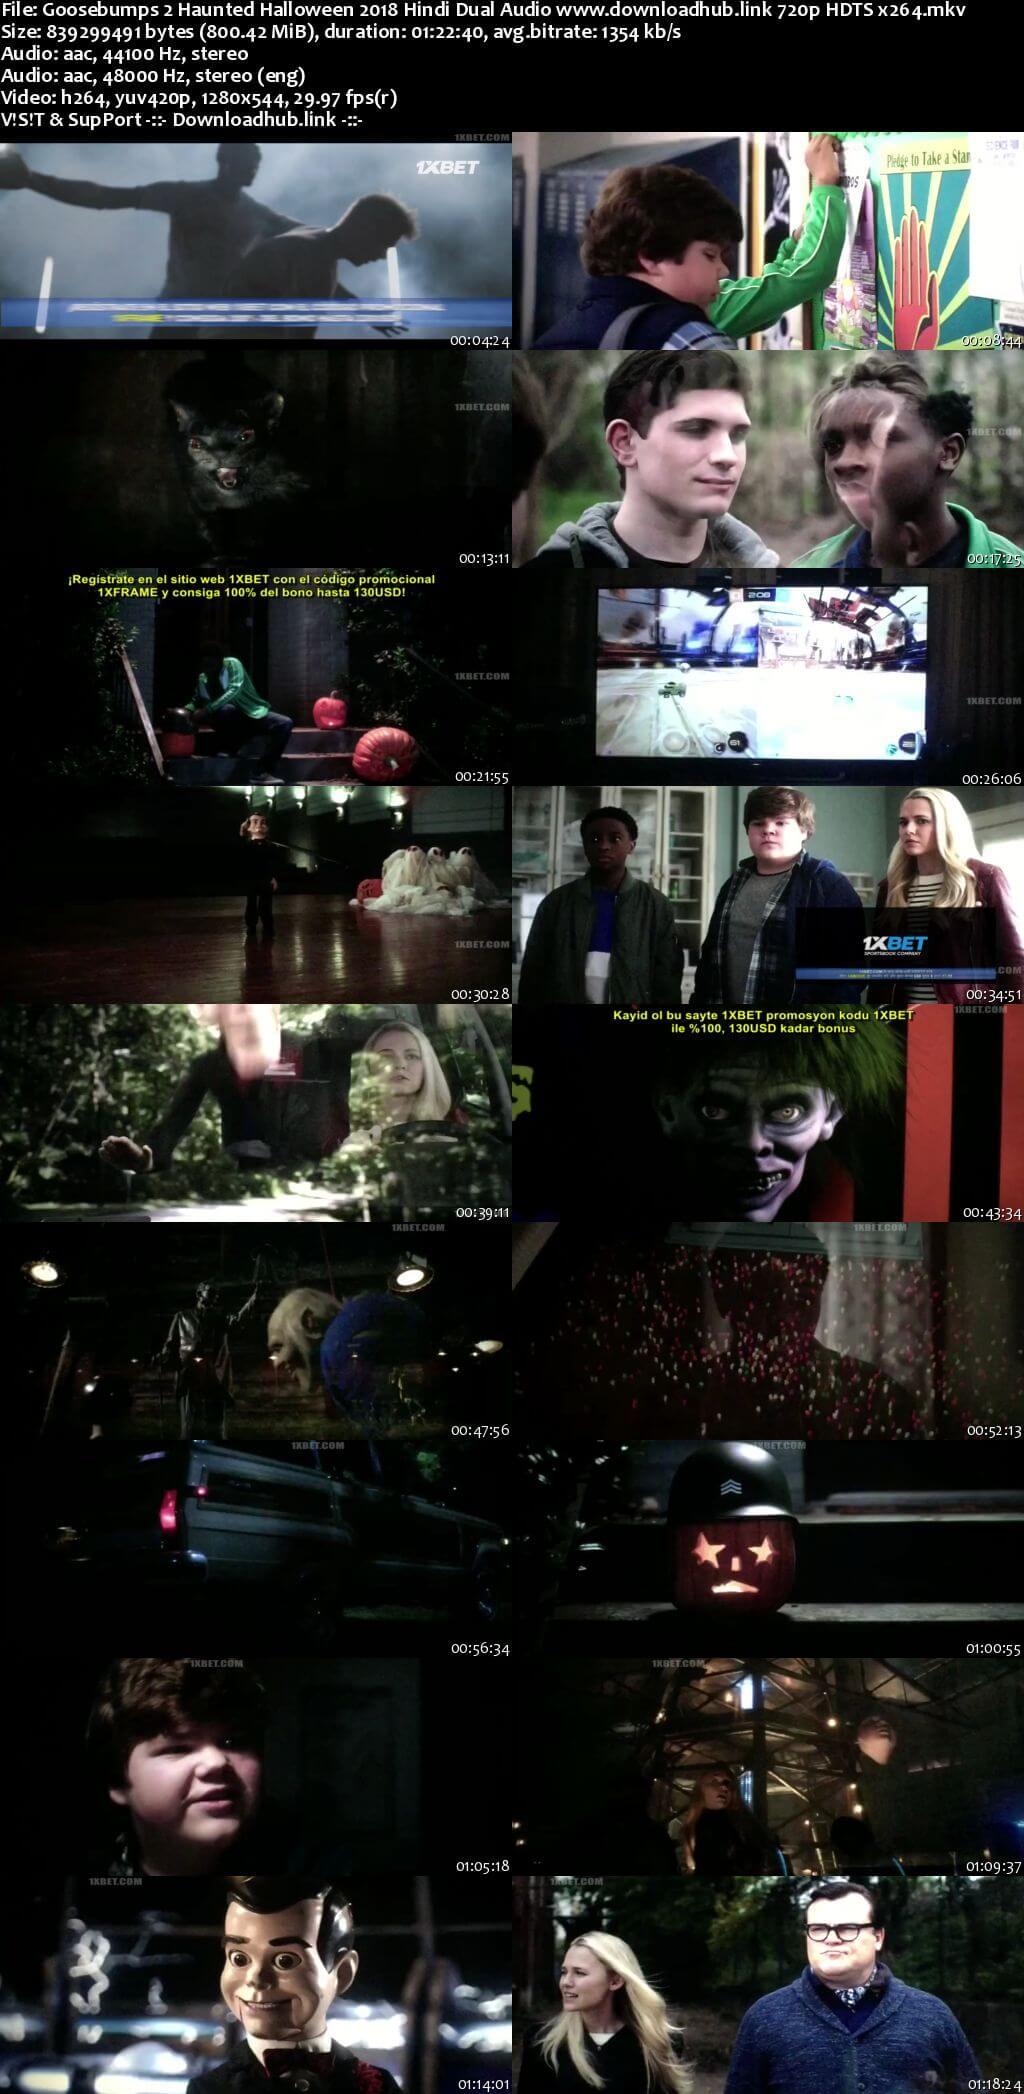 Goosebumps 2 Haunted Halloween 2018 Hindi Dual Audio 720p HDTS x264